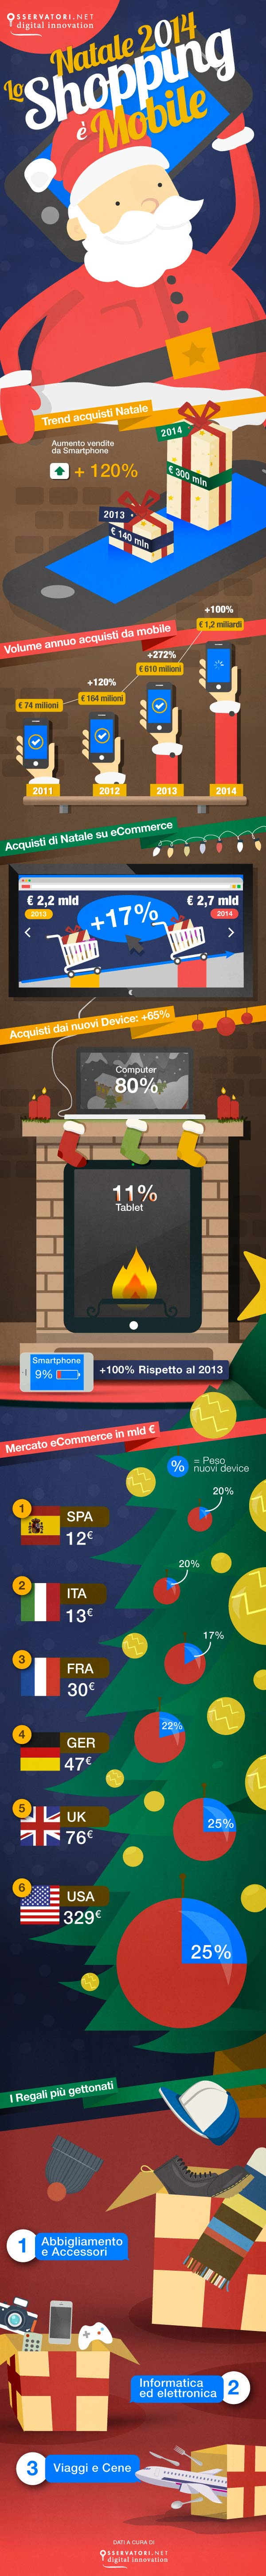 Infografica e-commerce Natale 2014